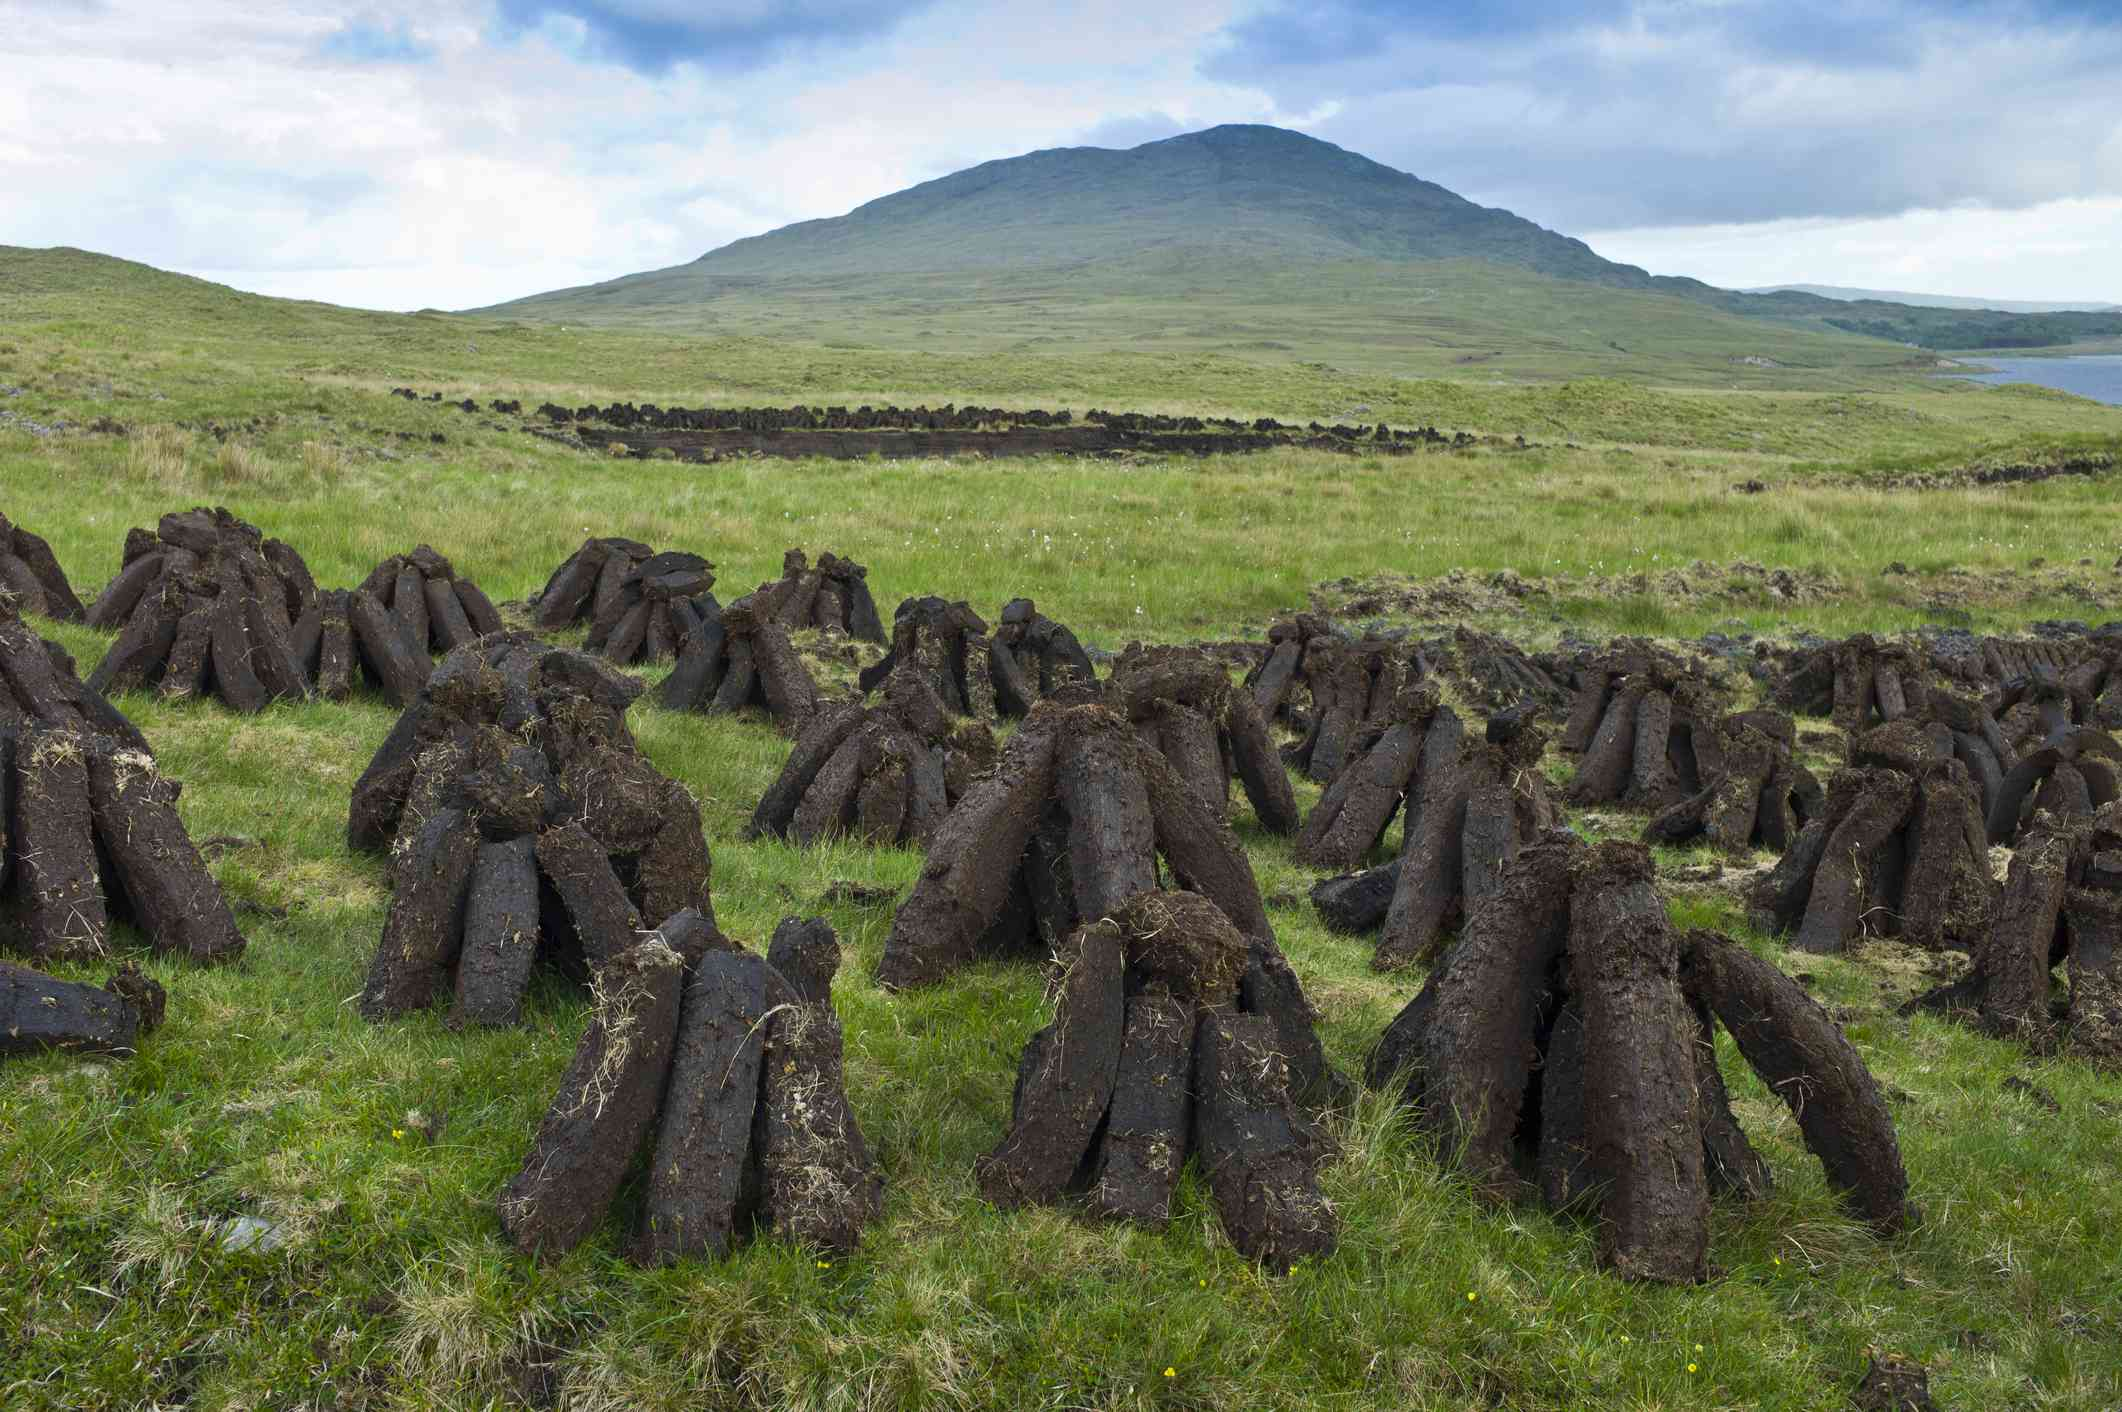 Peat bogs in Ireland